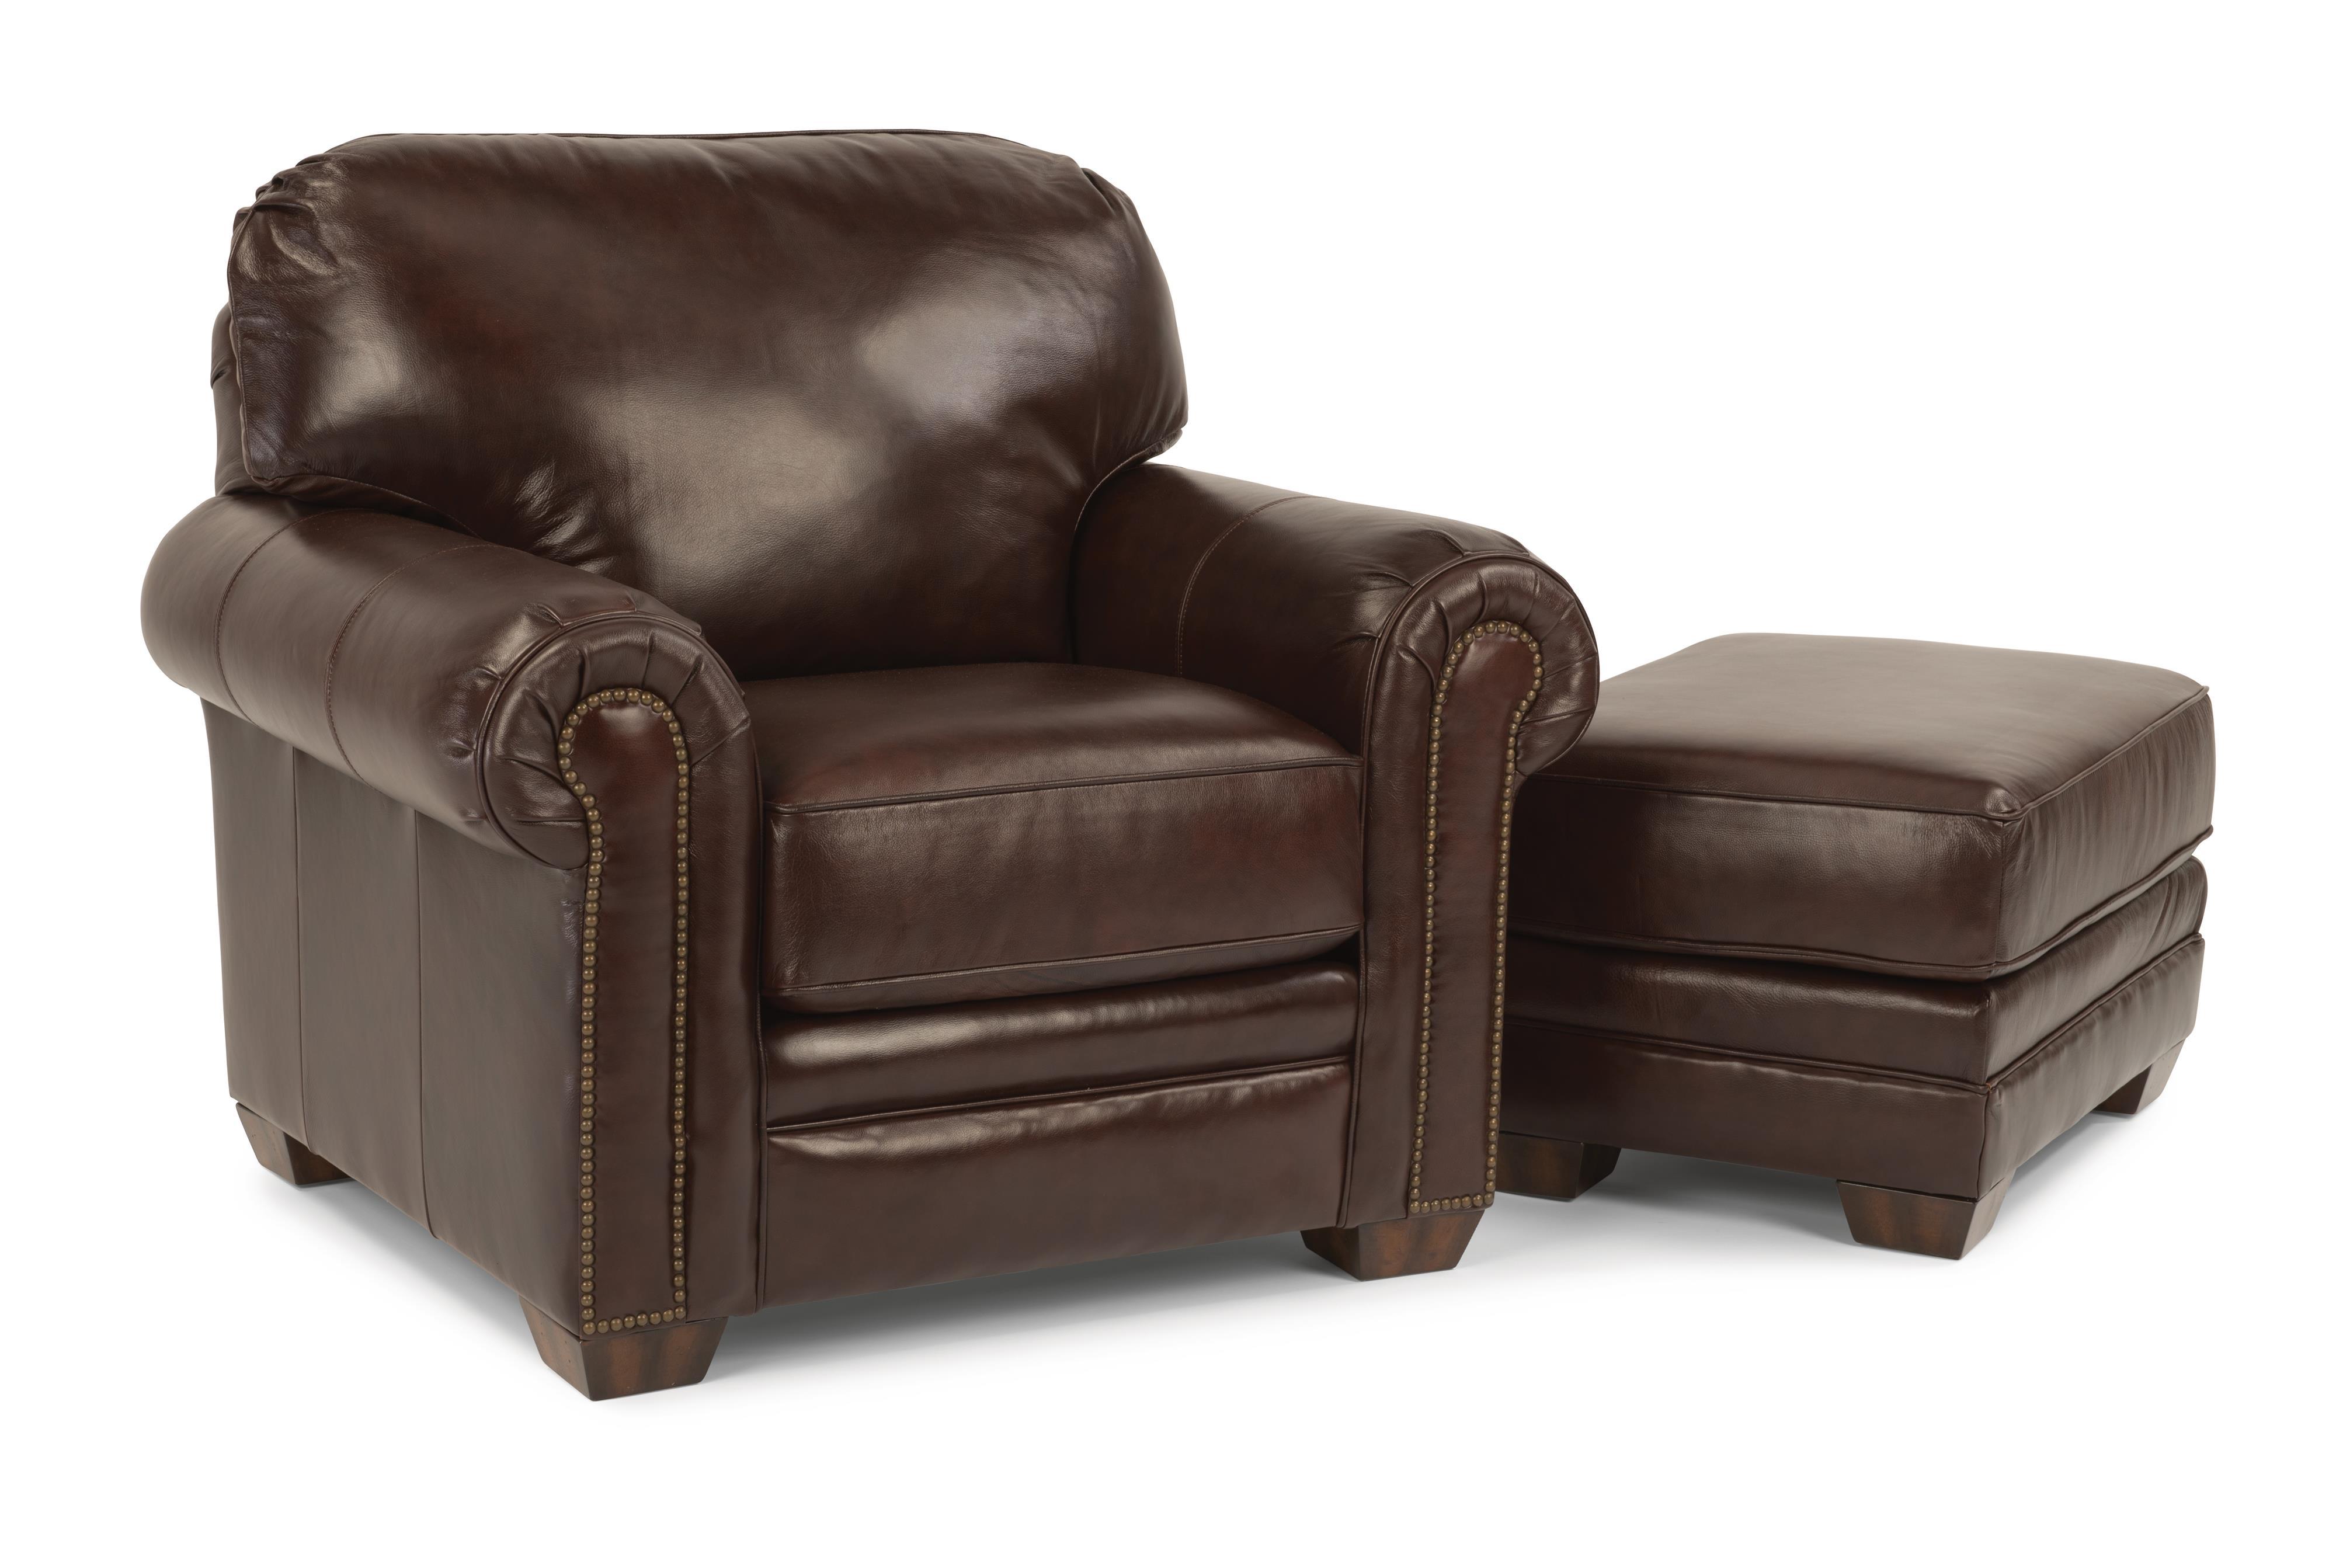 Flexsteel harrison upholstered chair and ottoman hudson for Hudsons furniture